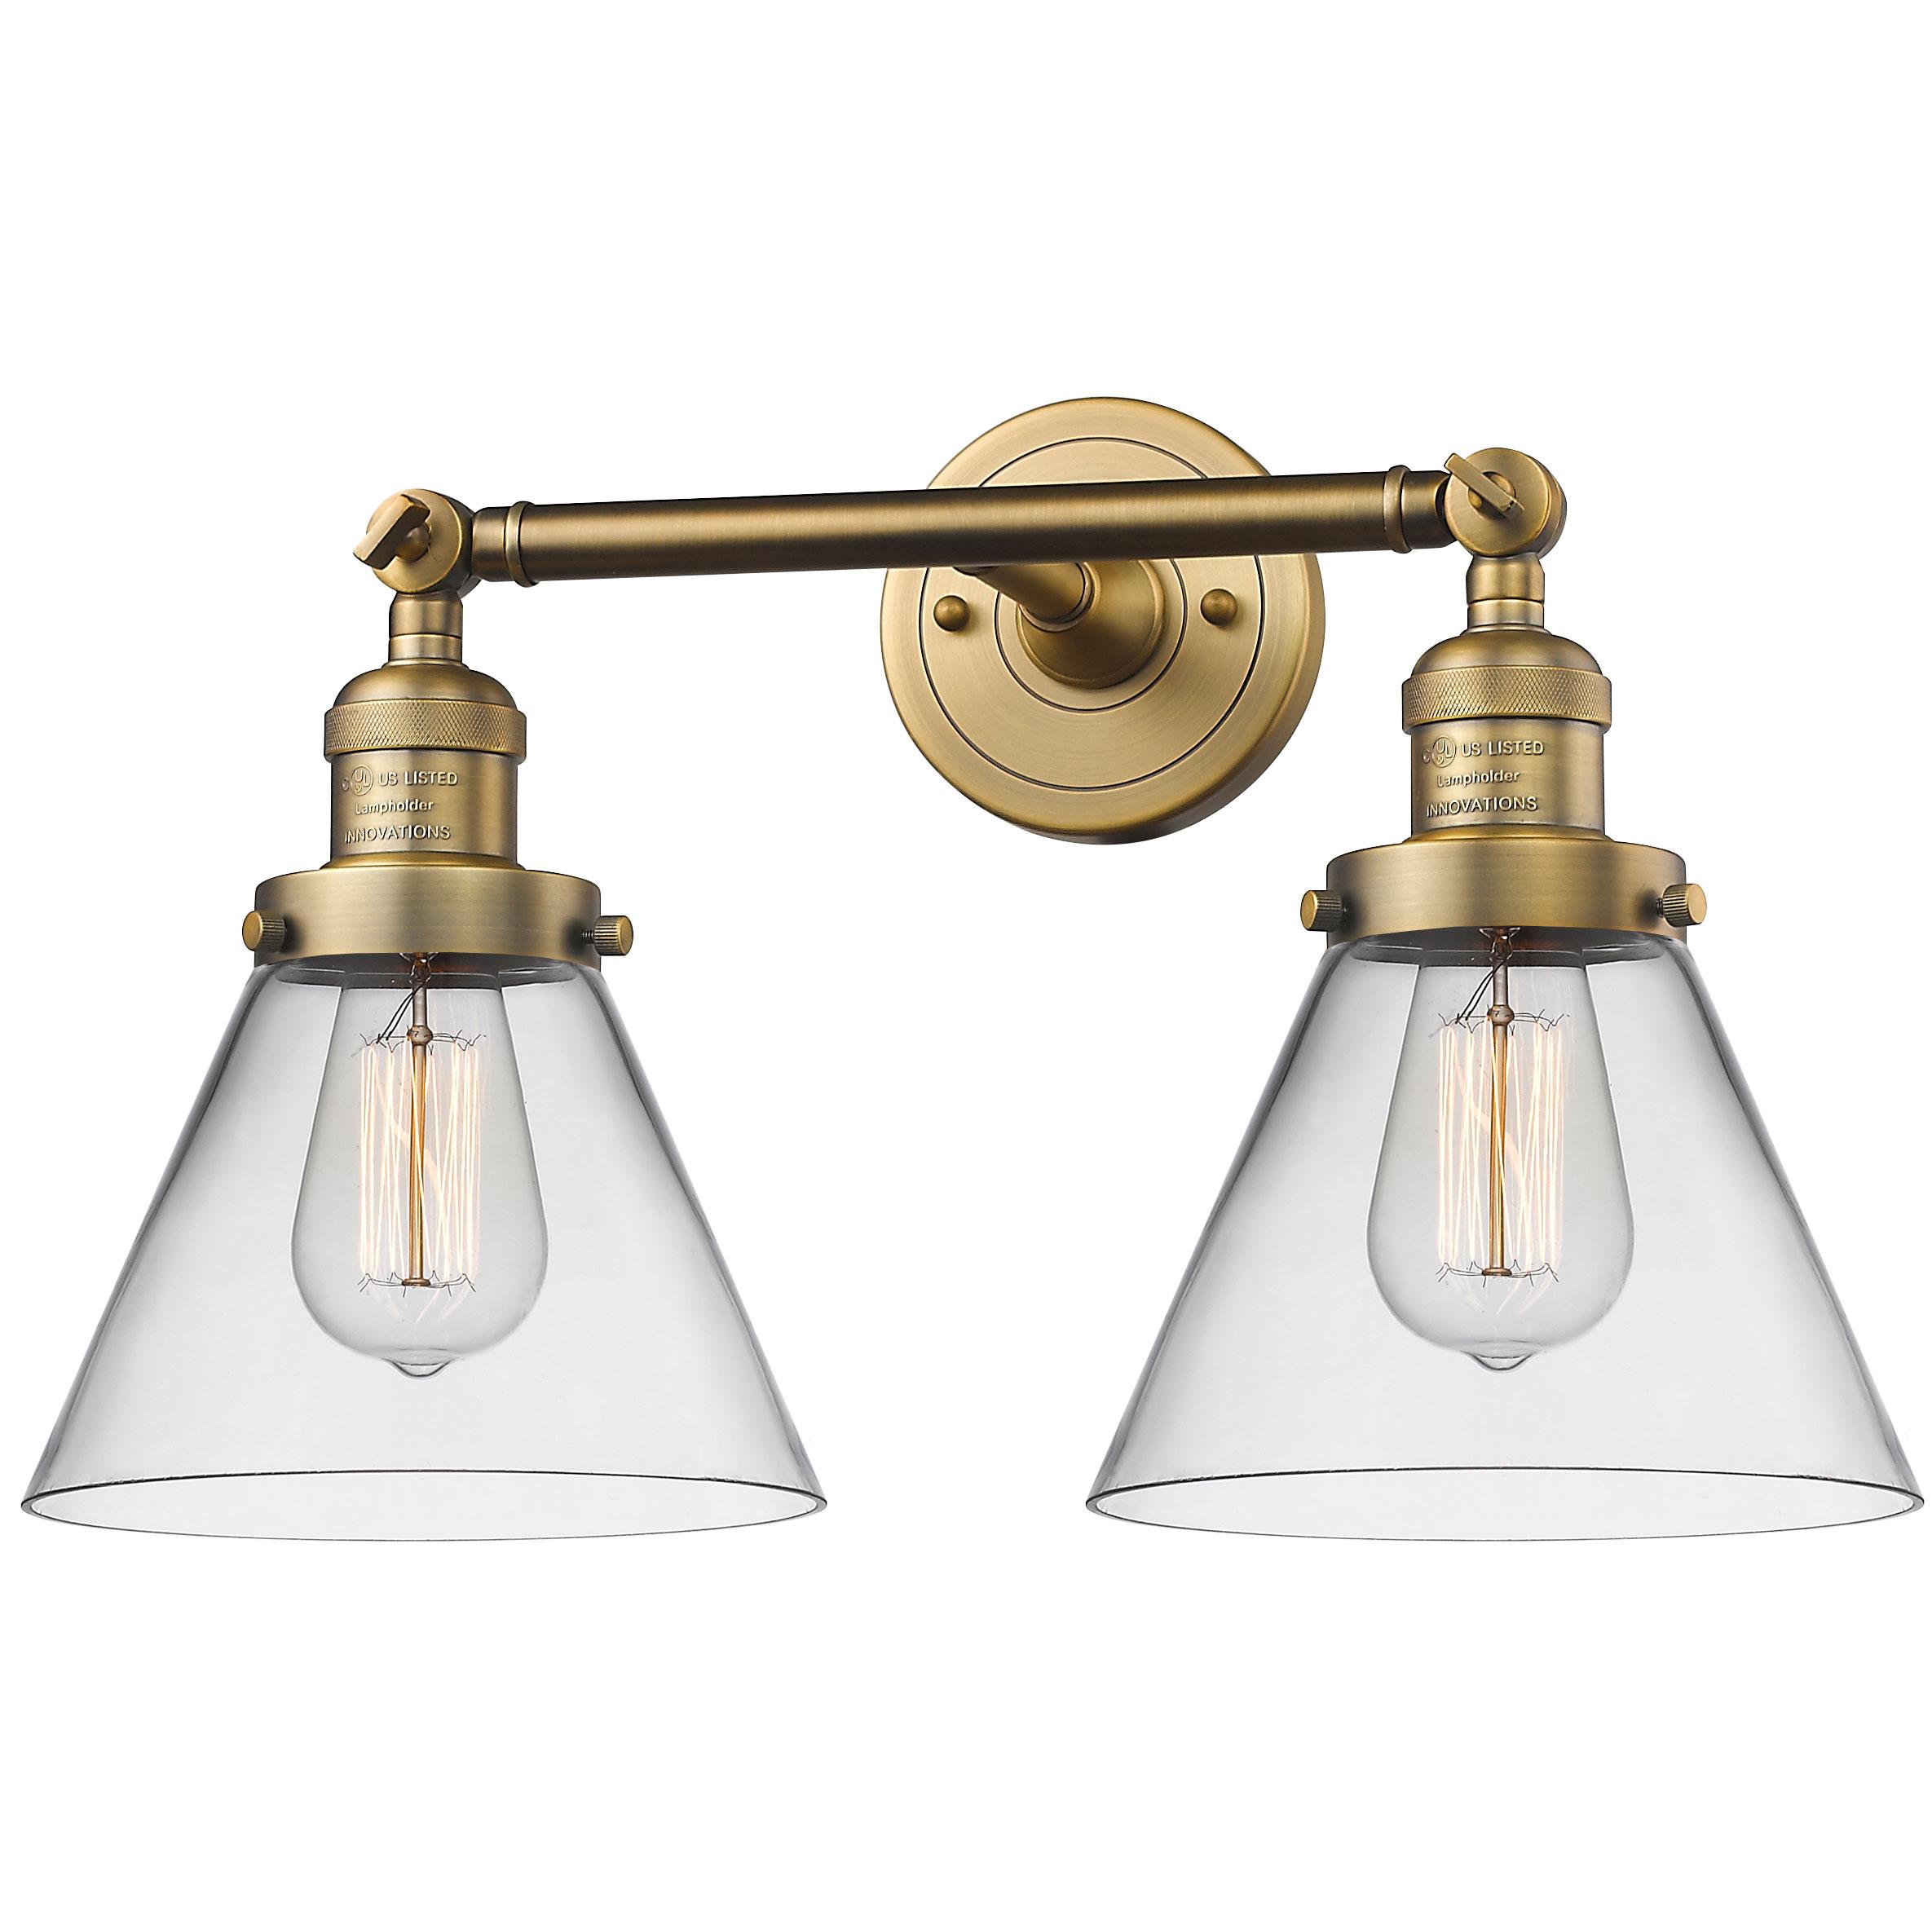 Large Cone 2 Light Bathroom Vanity By, 2 Light Bathroom Vanity Light